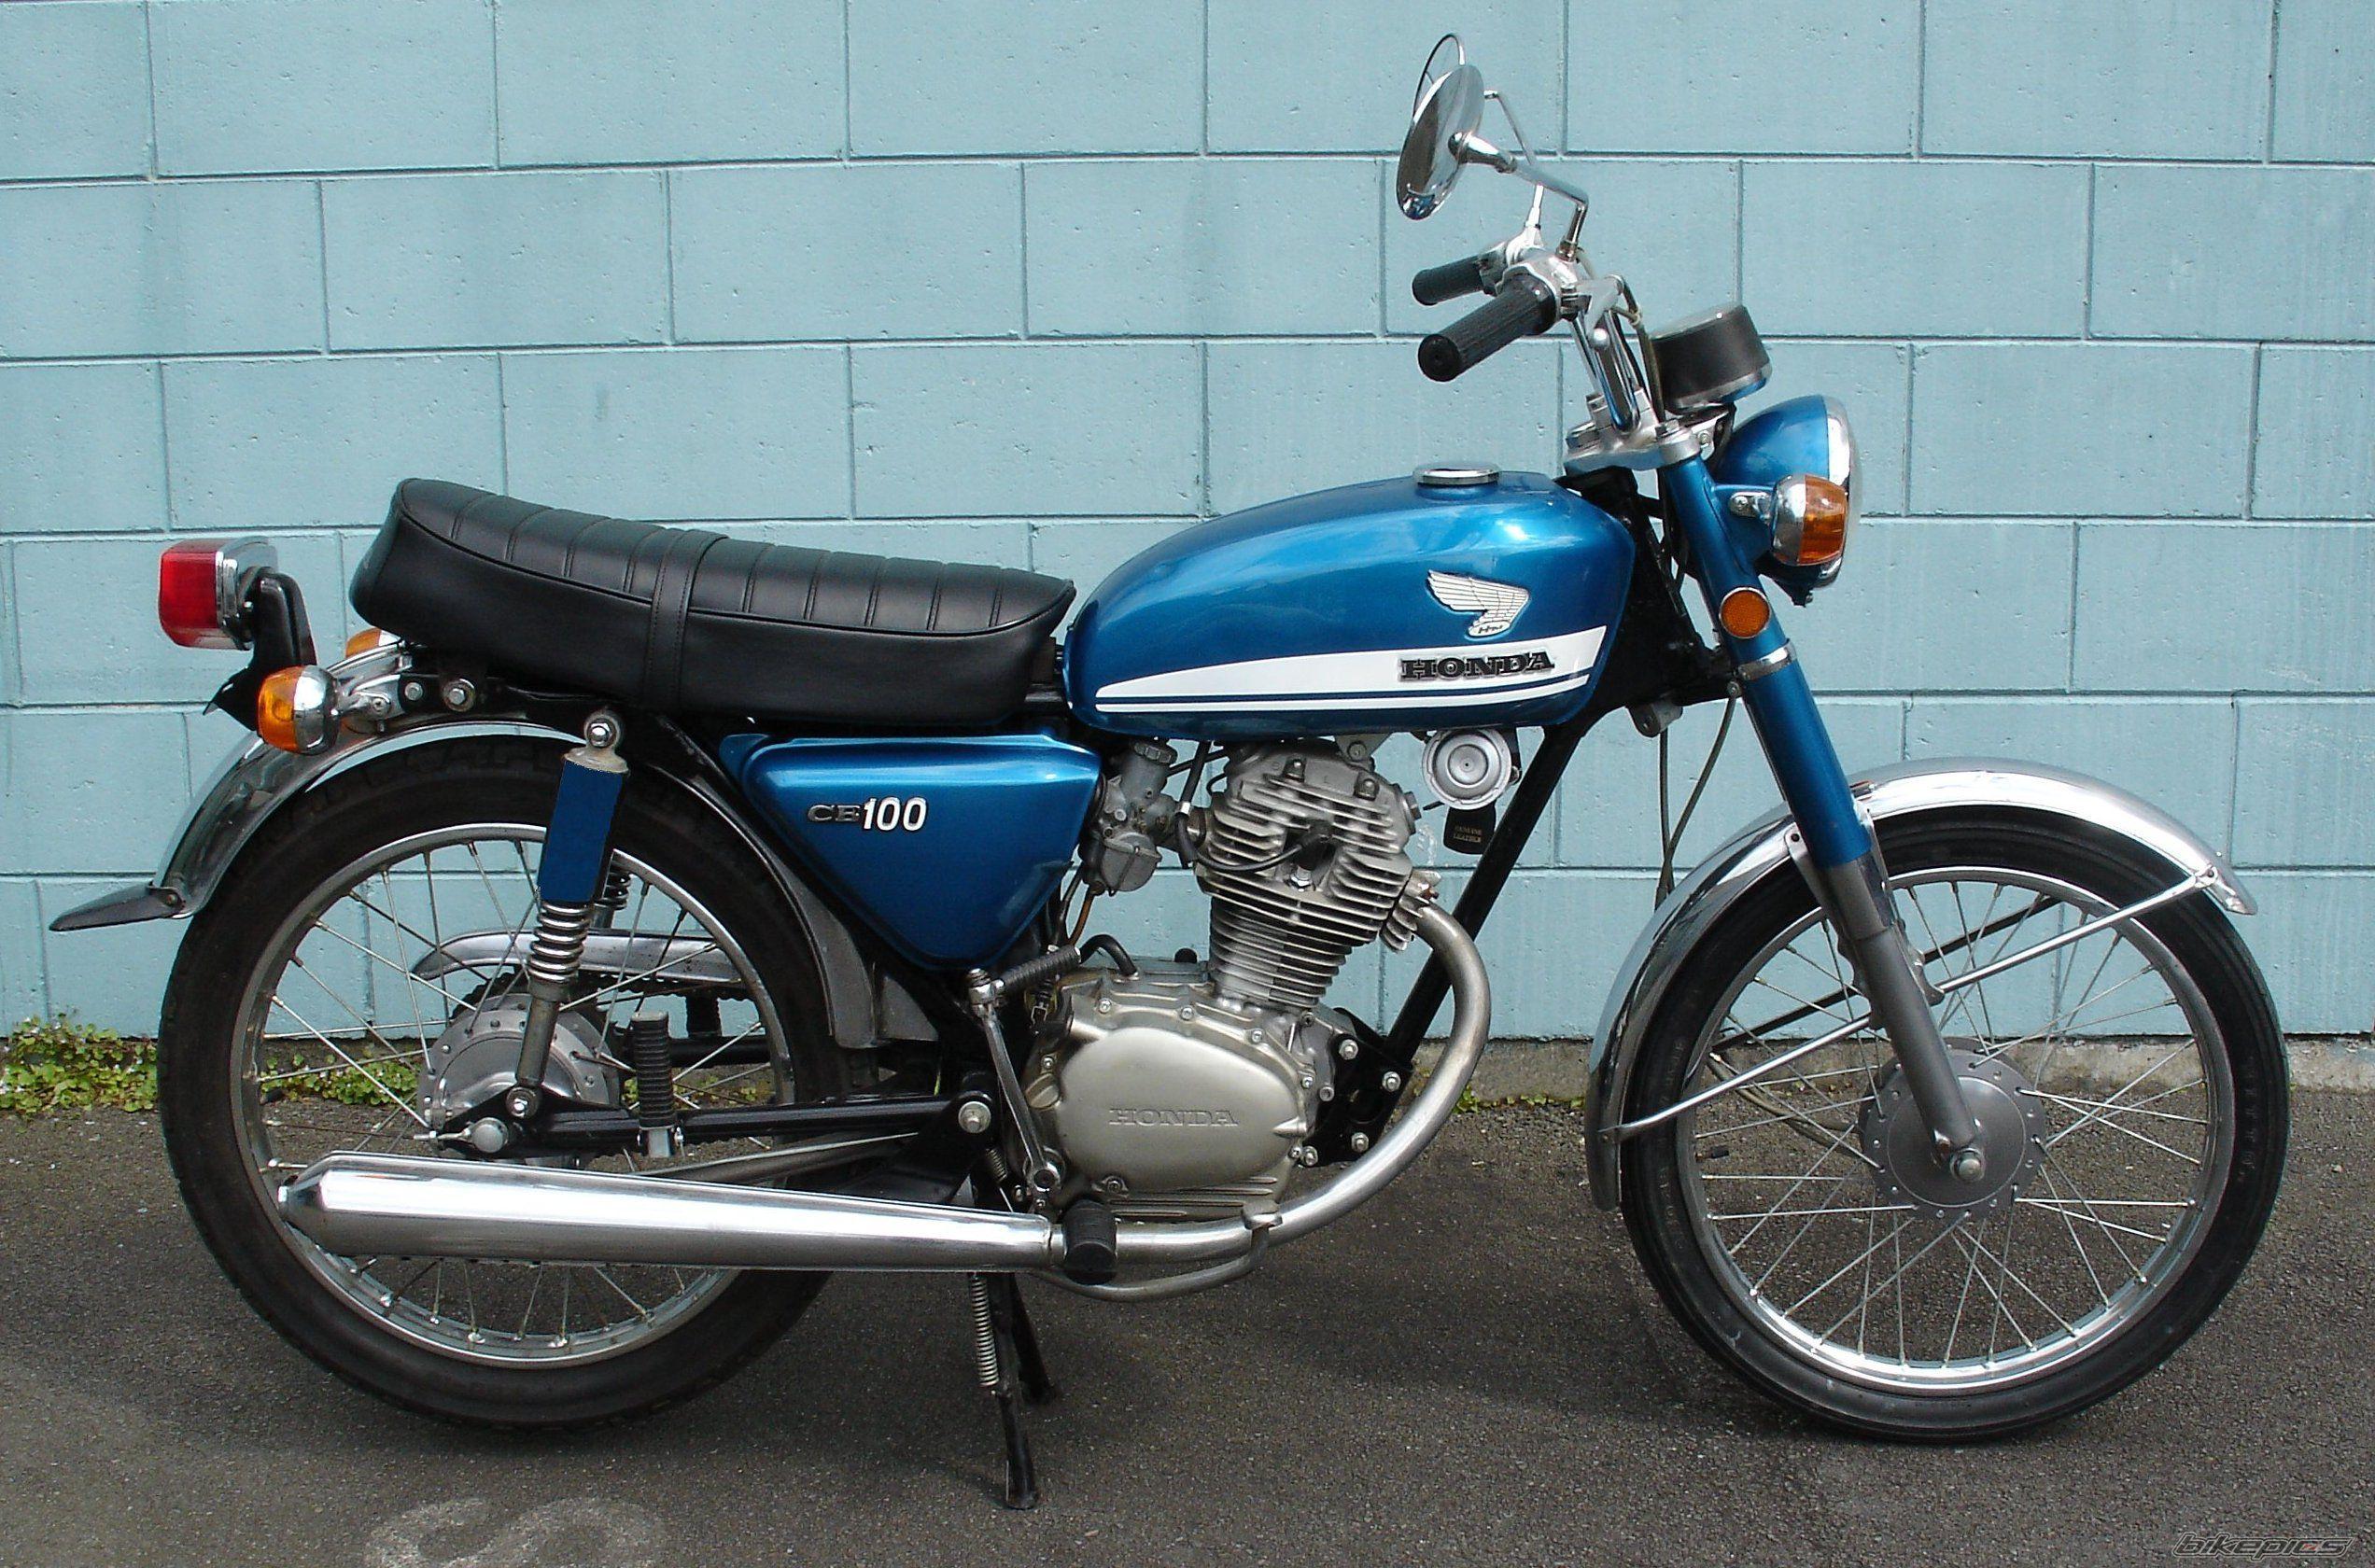 Kelebihan Honda 100 Murah Berkualitas